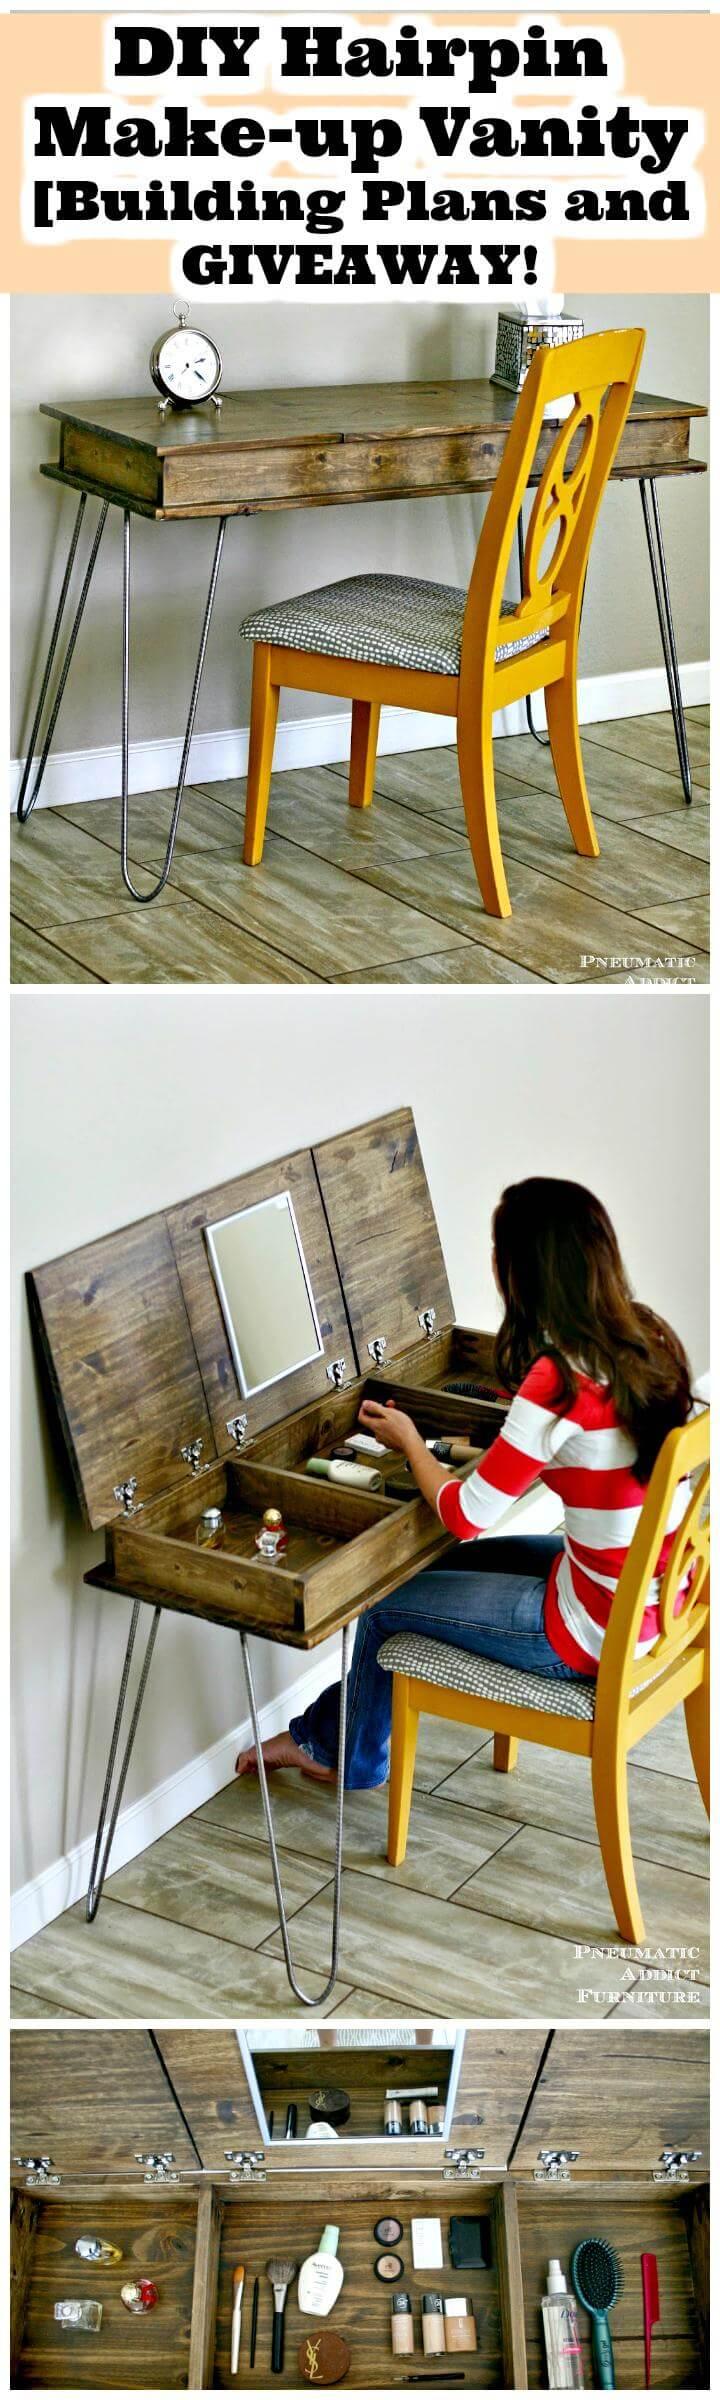 DIY hairpin makeup vanity building plans and giveaway